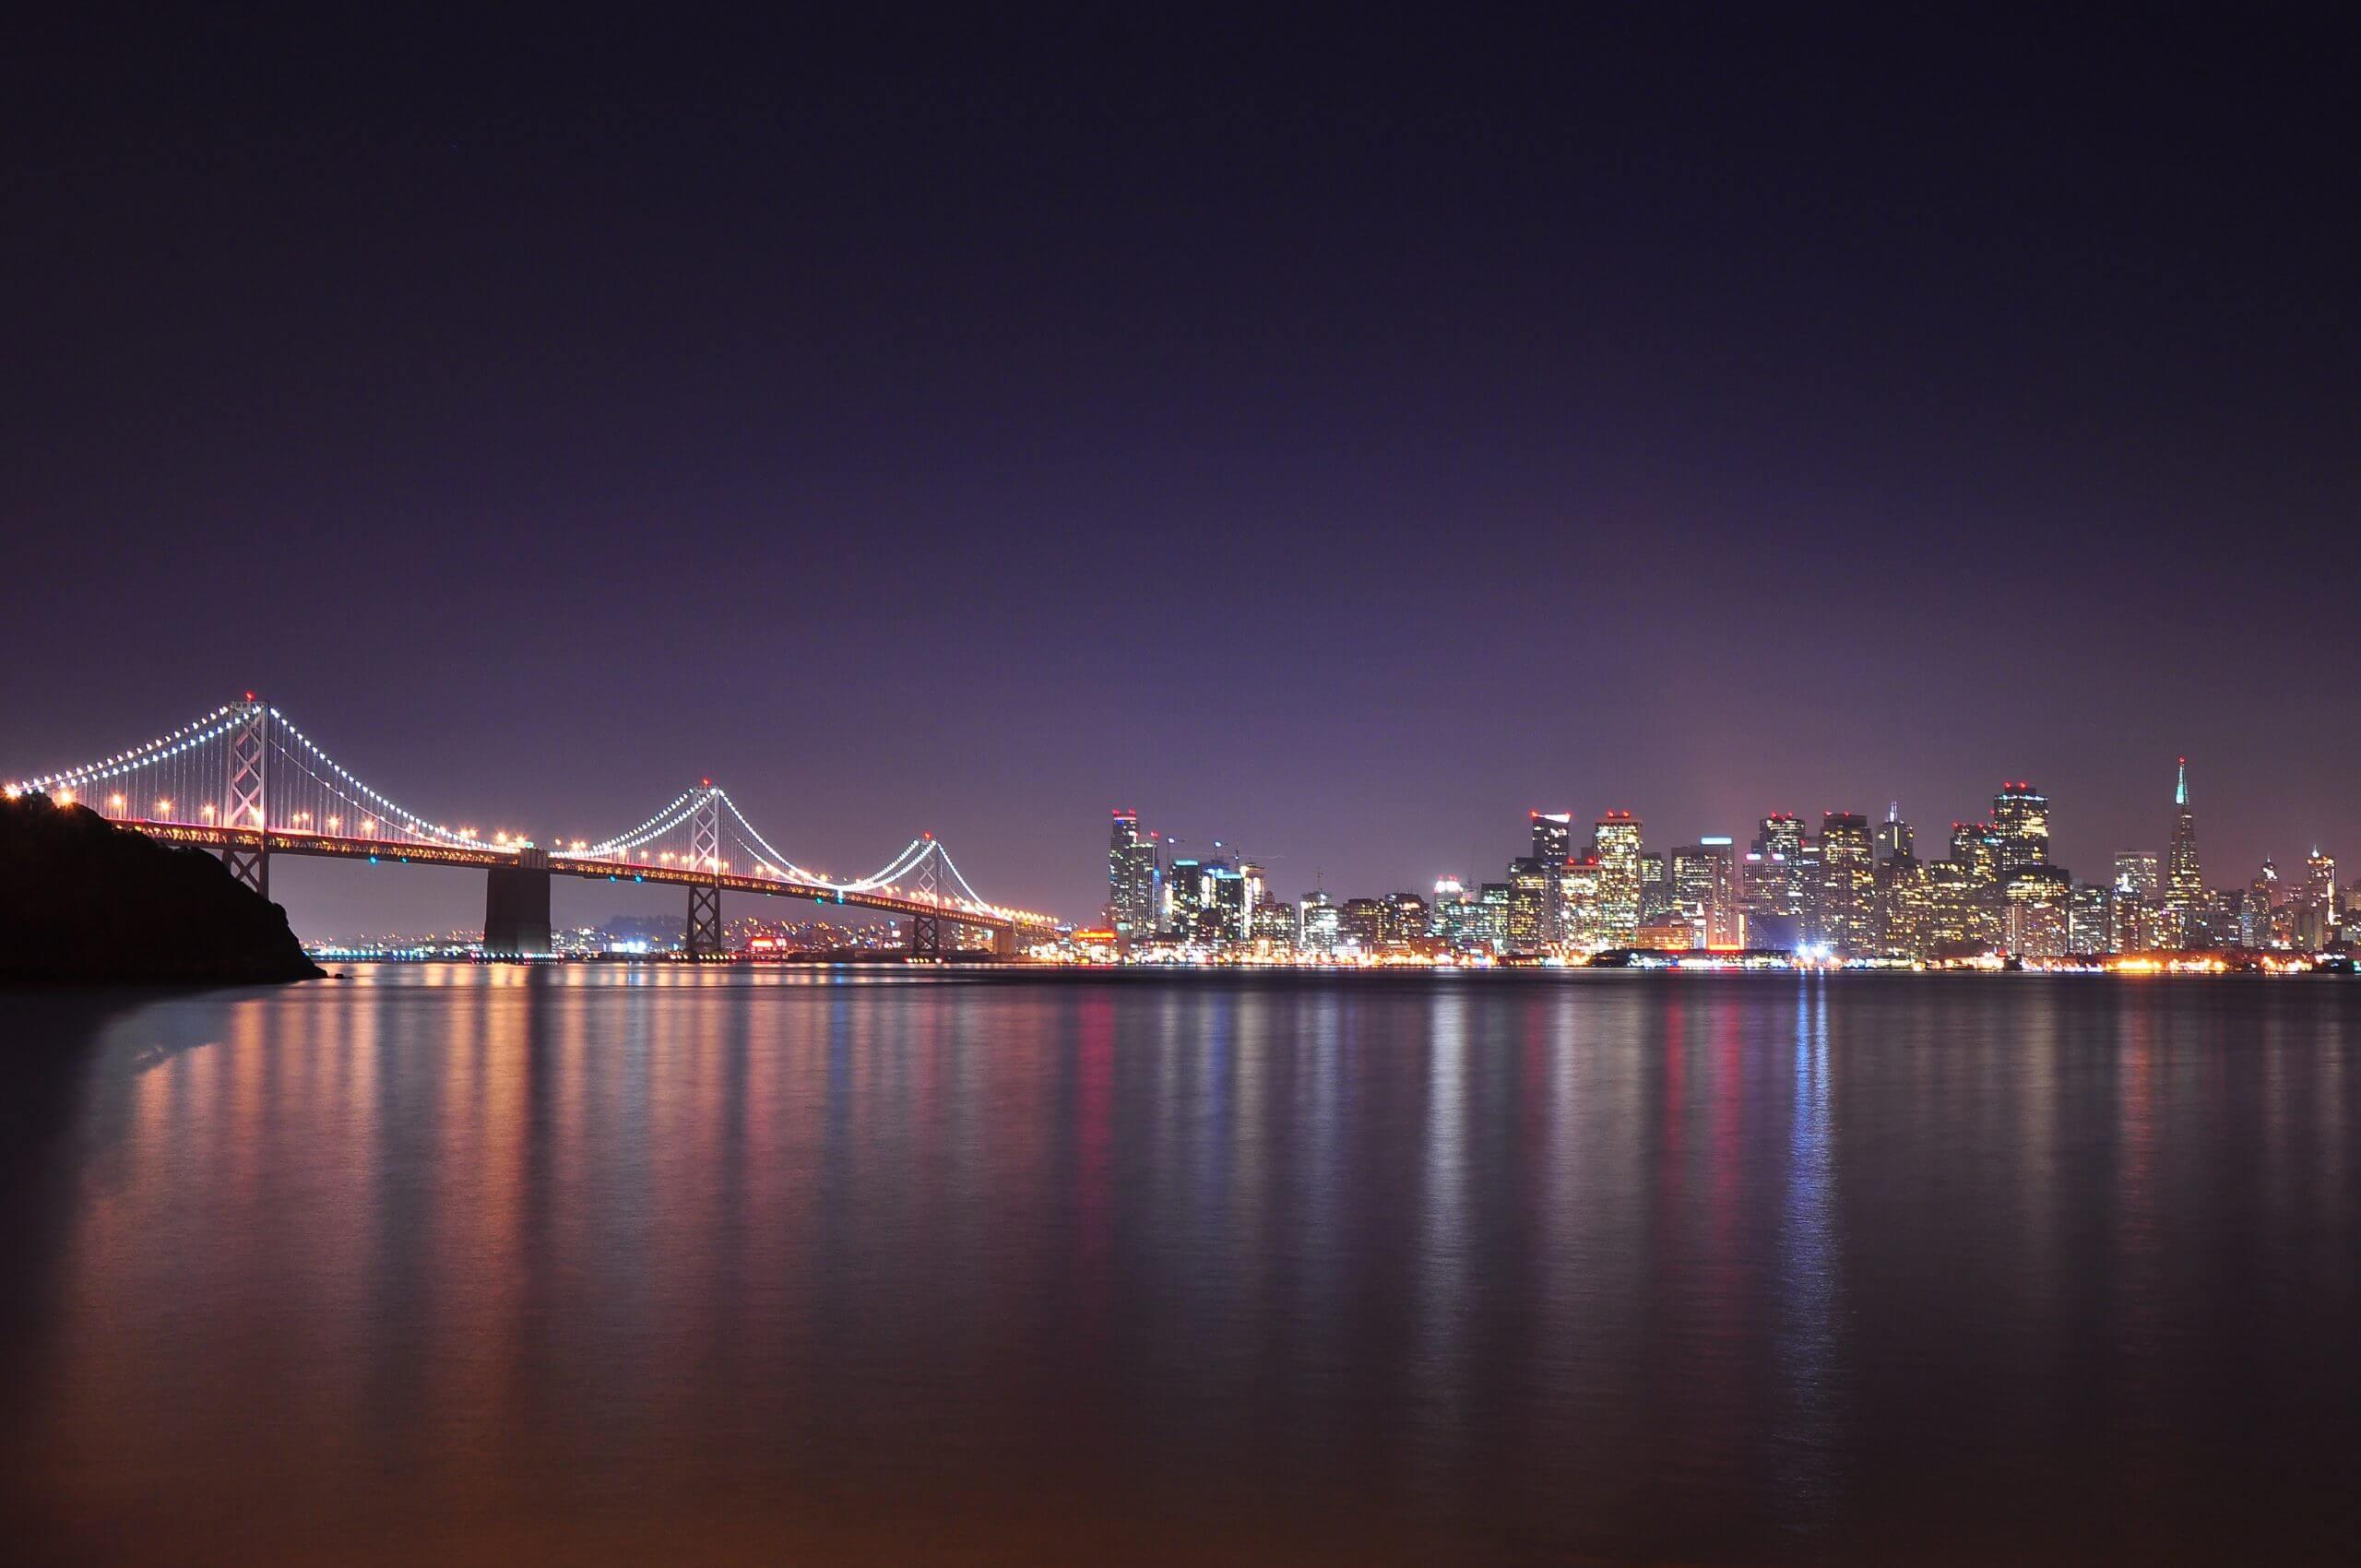 Bay Bridge and San Francisco skyline at night